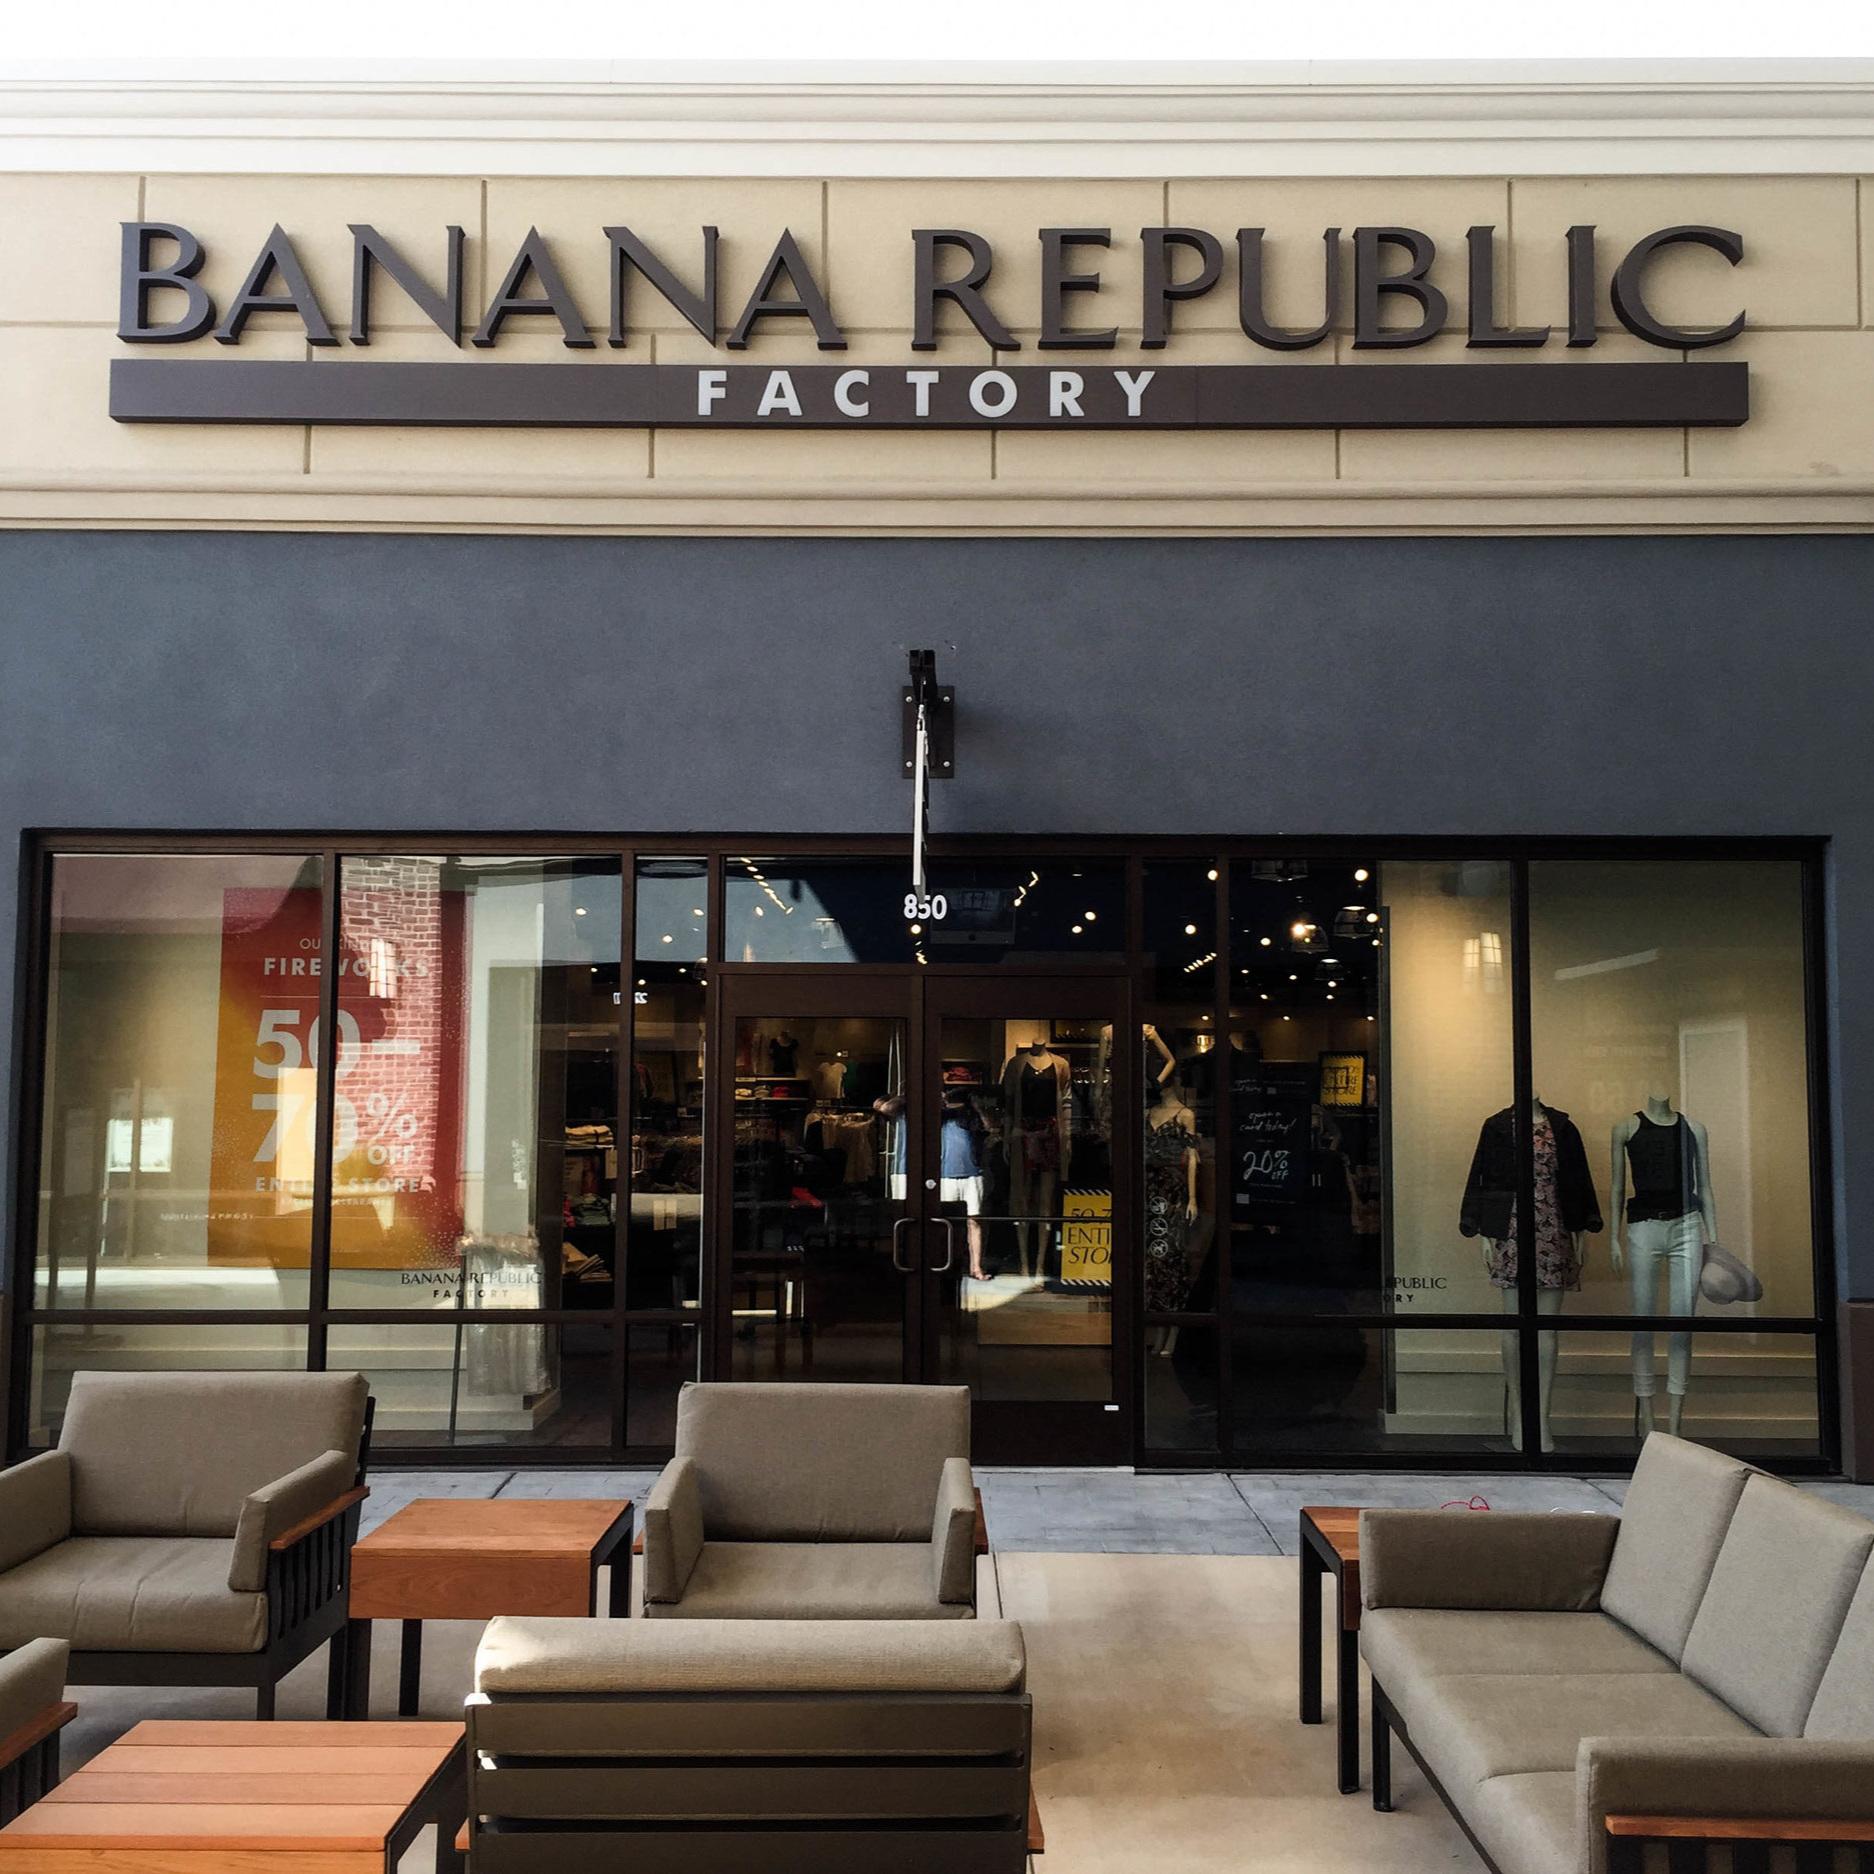 BANANA REPUBLIC  Since 2004